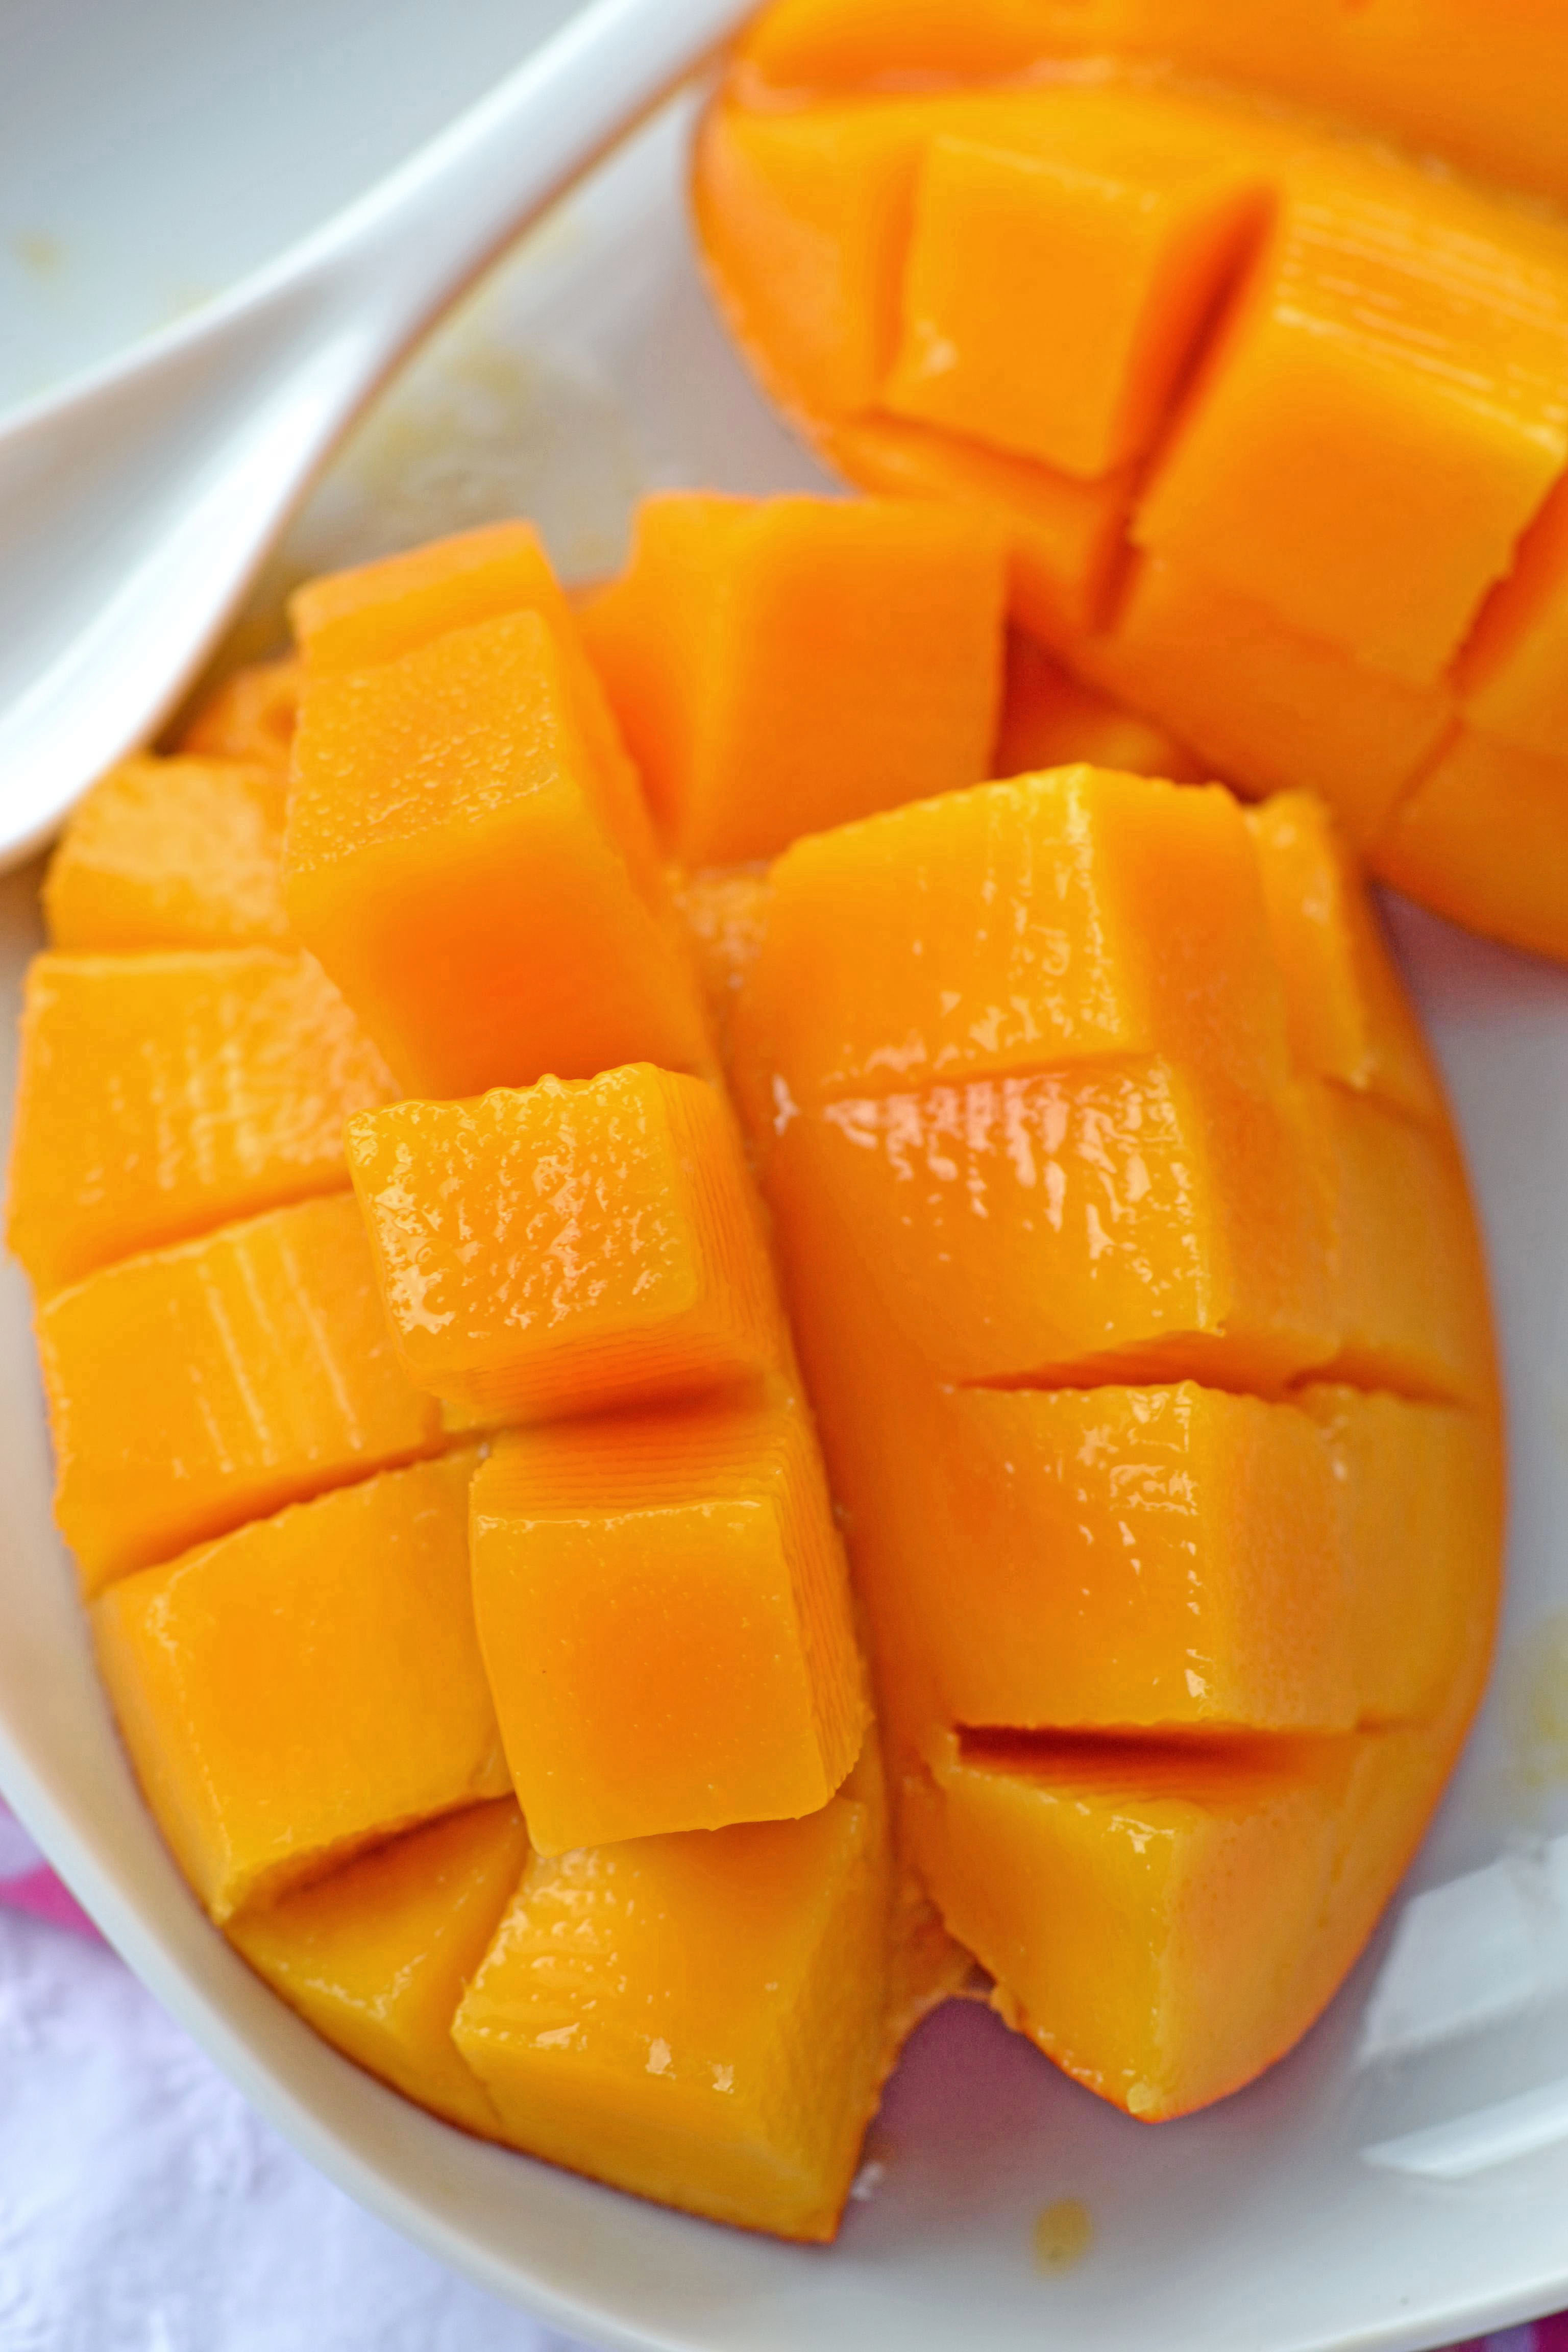 Cut Mango Churnless Bananamango Frozen Yogurt Suzie Sweet Tooth How To Cut  A Mango Like A